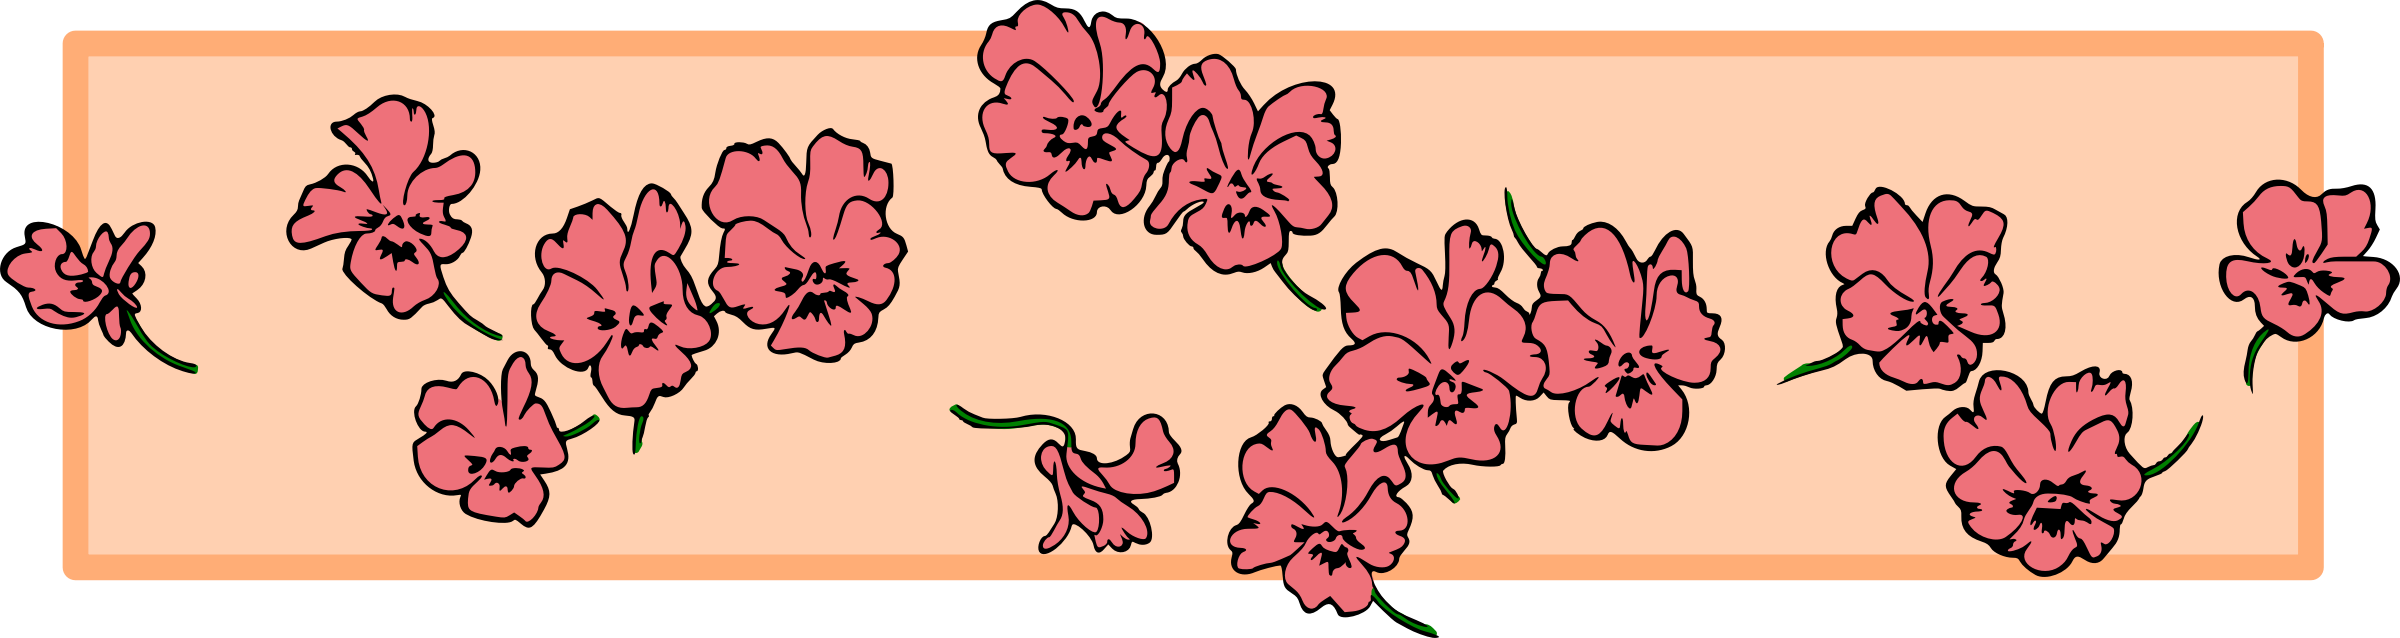 Floral clipart divider. Colour big image png